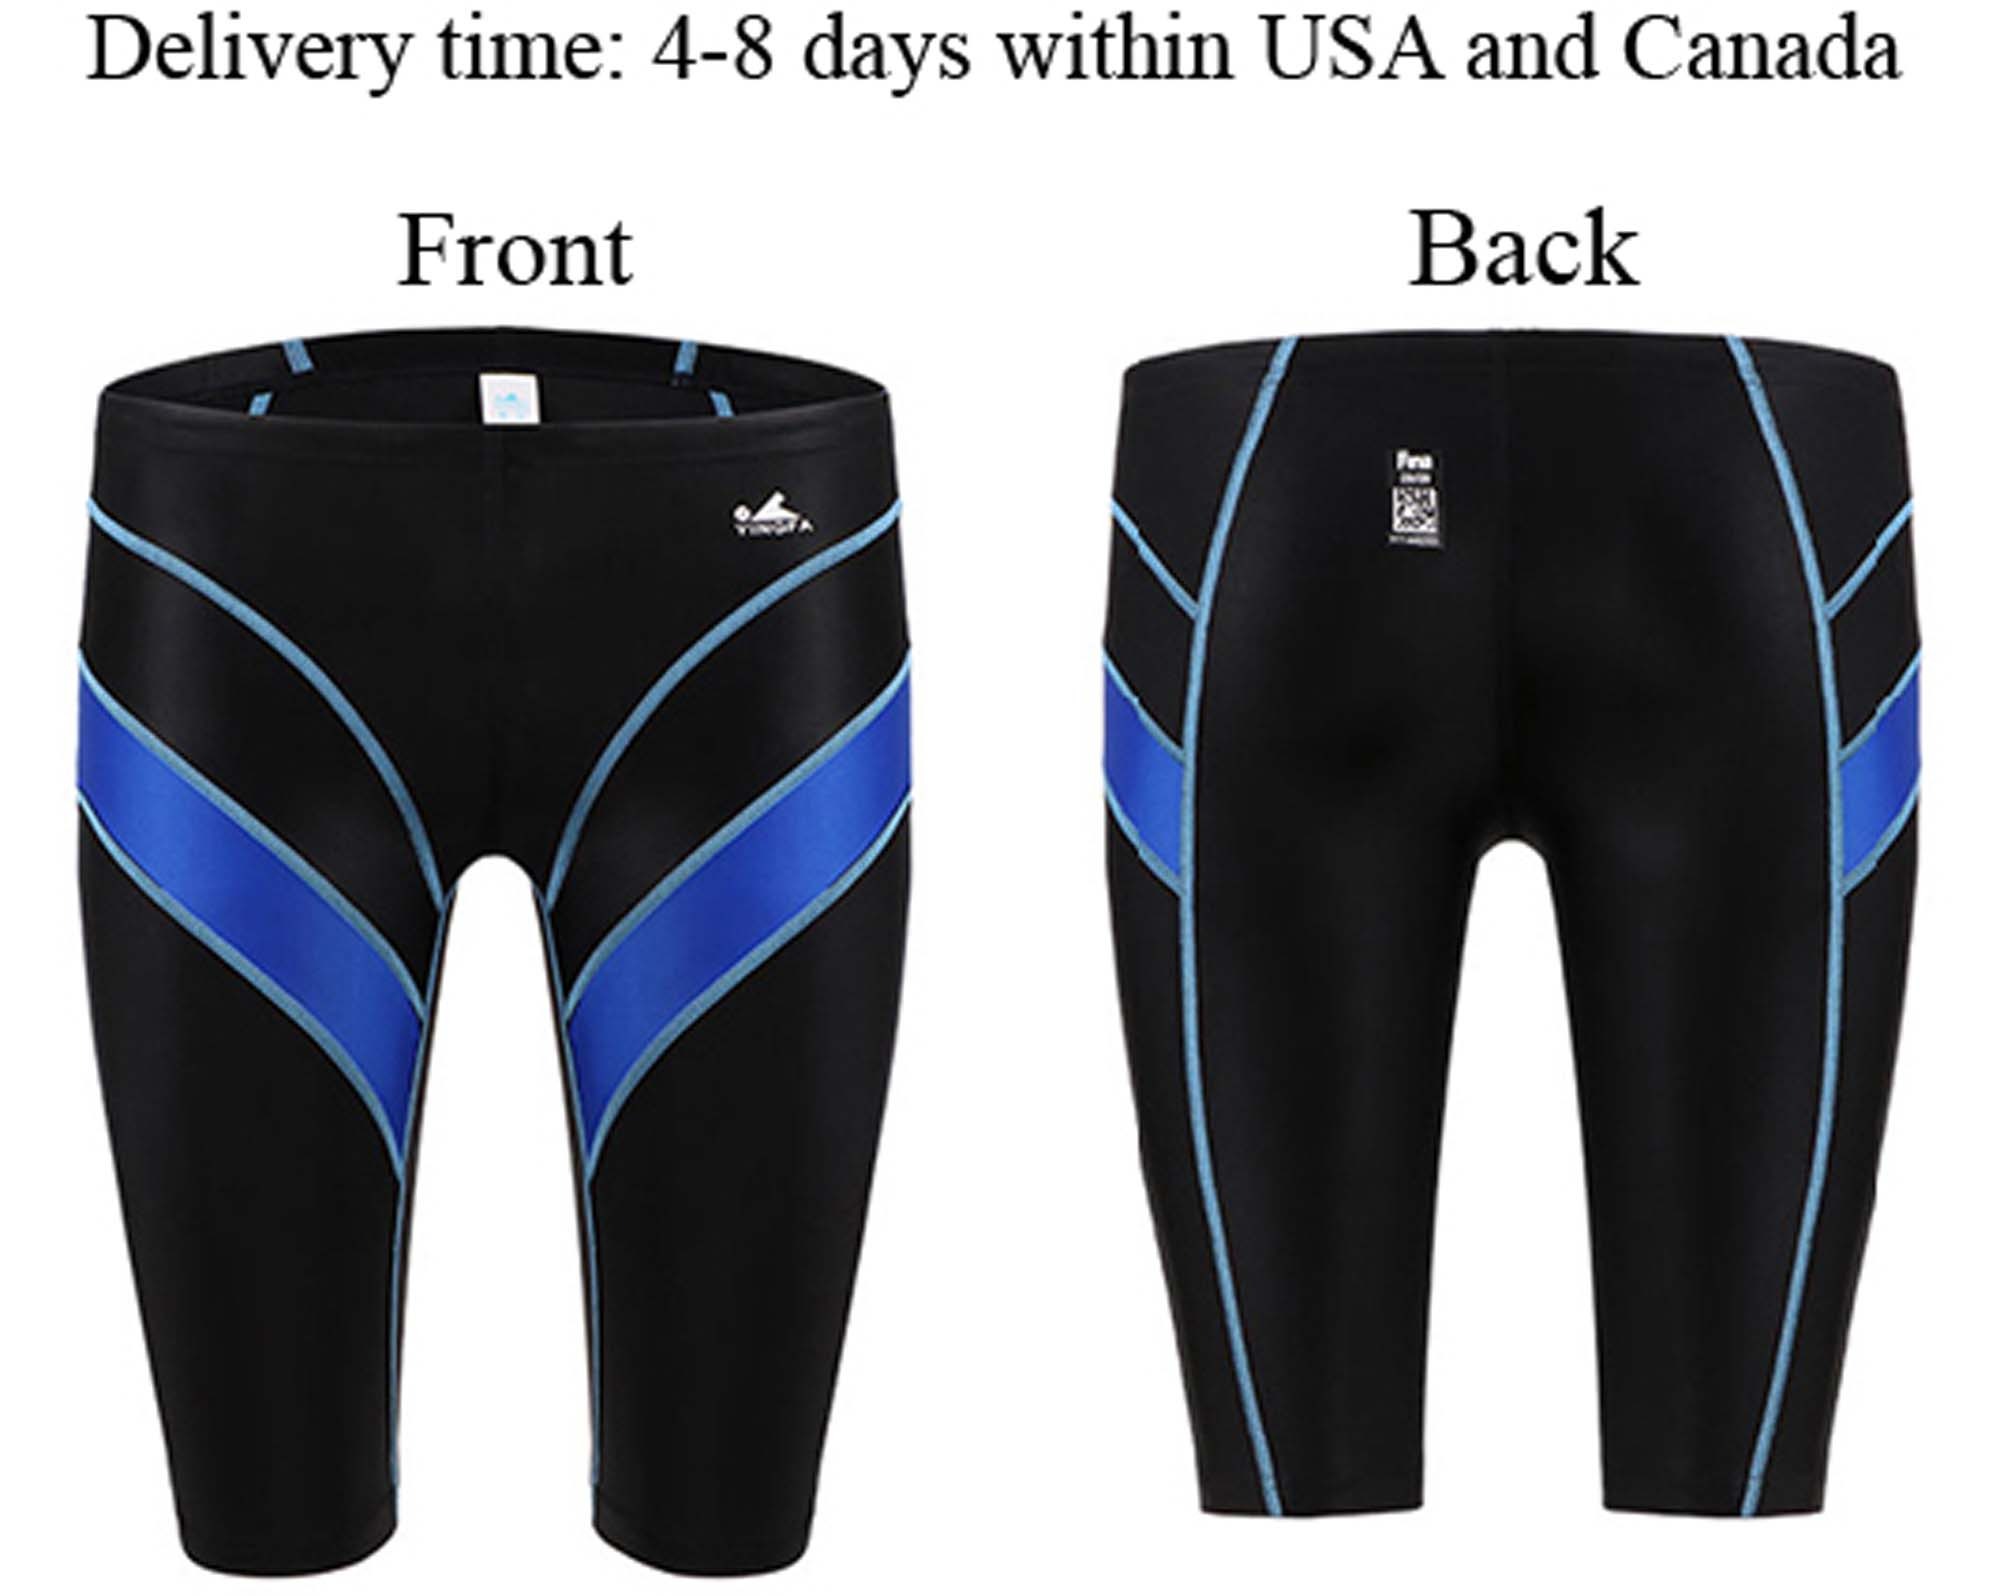 7f732f49af Men's racing & training swimming jammers FINA APPROVED swim trunks, Yingfa  9402-1 Black swim shorts